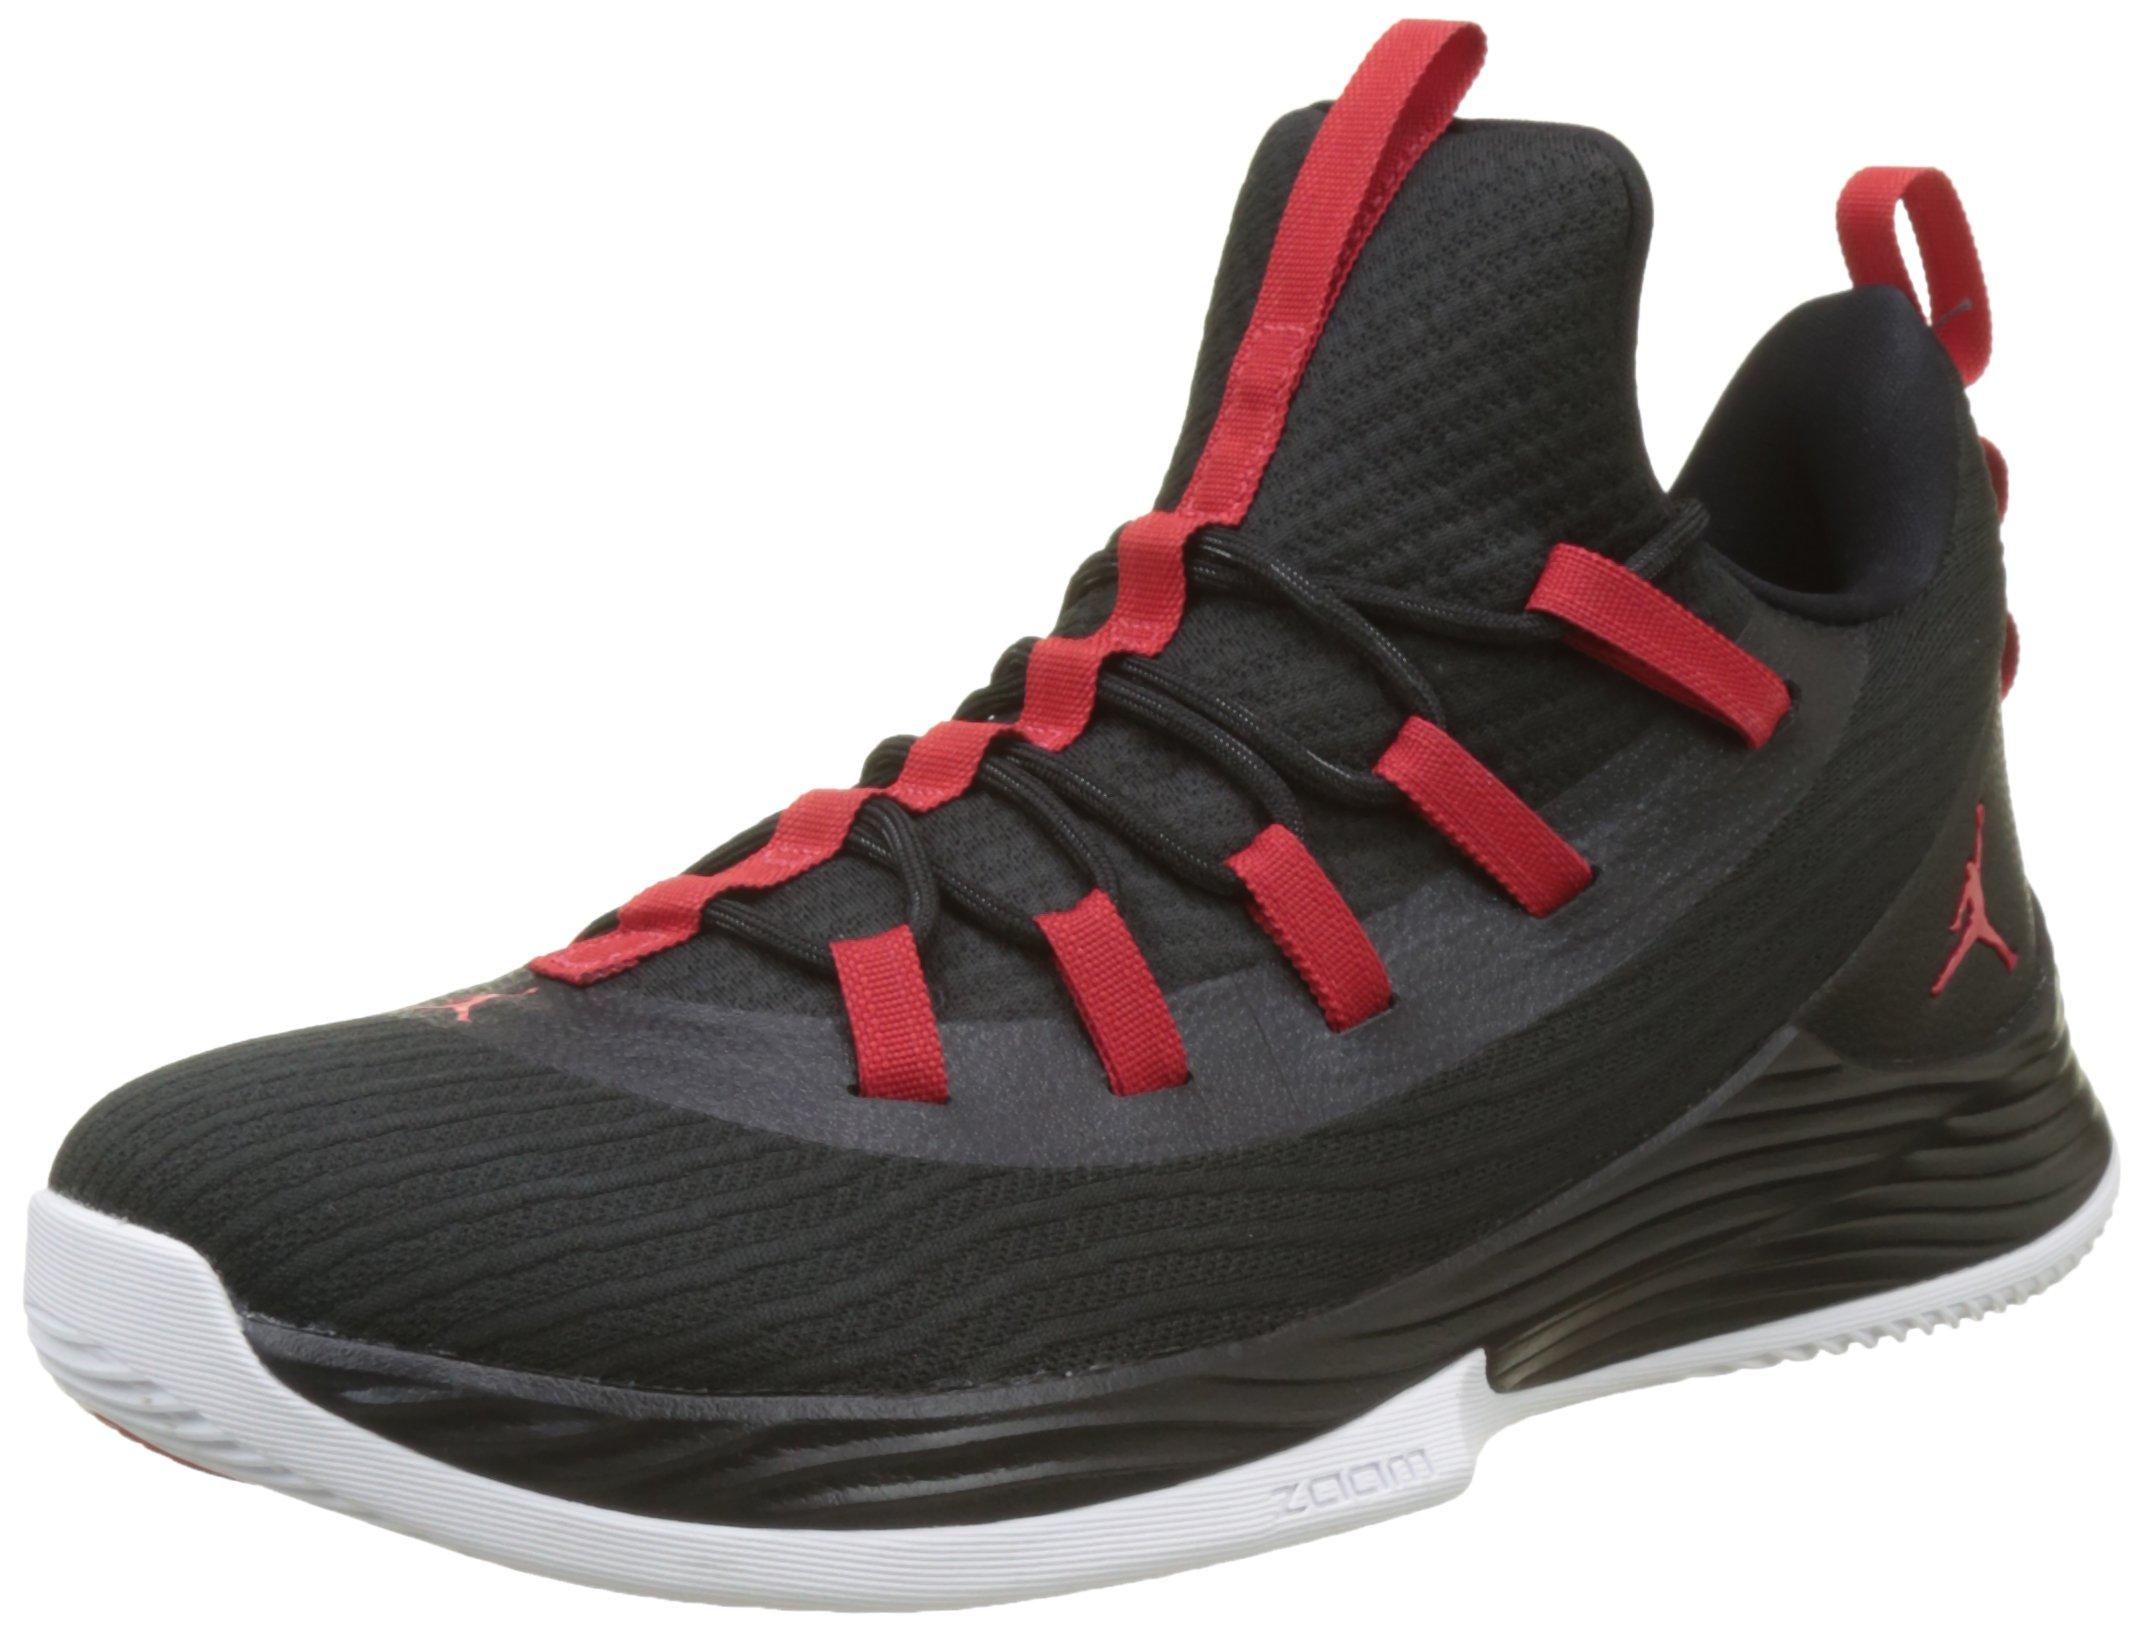 Jordan Nike Men's Ultra Fly 2 Low Black/University Red White Basketball Shoe 10 Men US